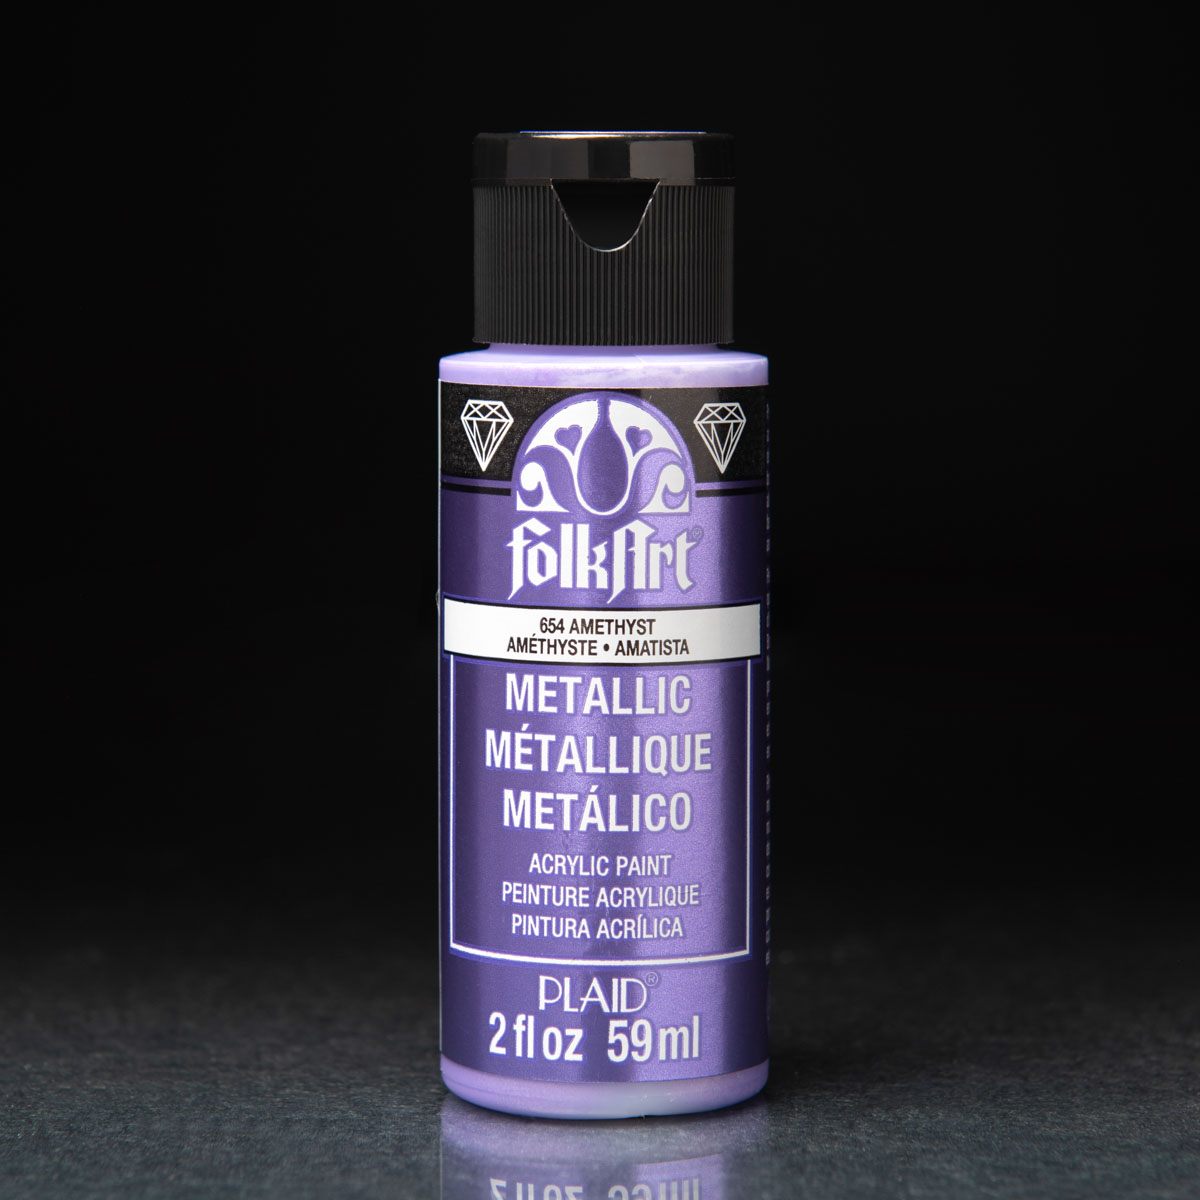 FolkArt ® Metallics Paint Set, 18 Colors - PROMOFAM